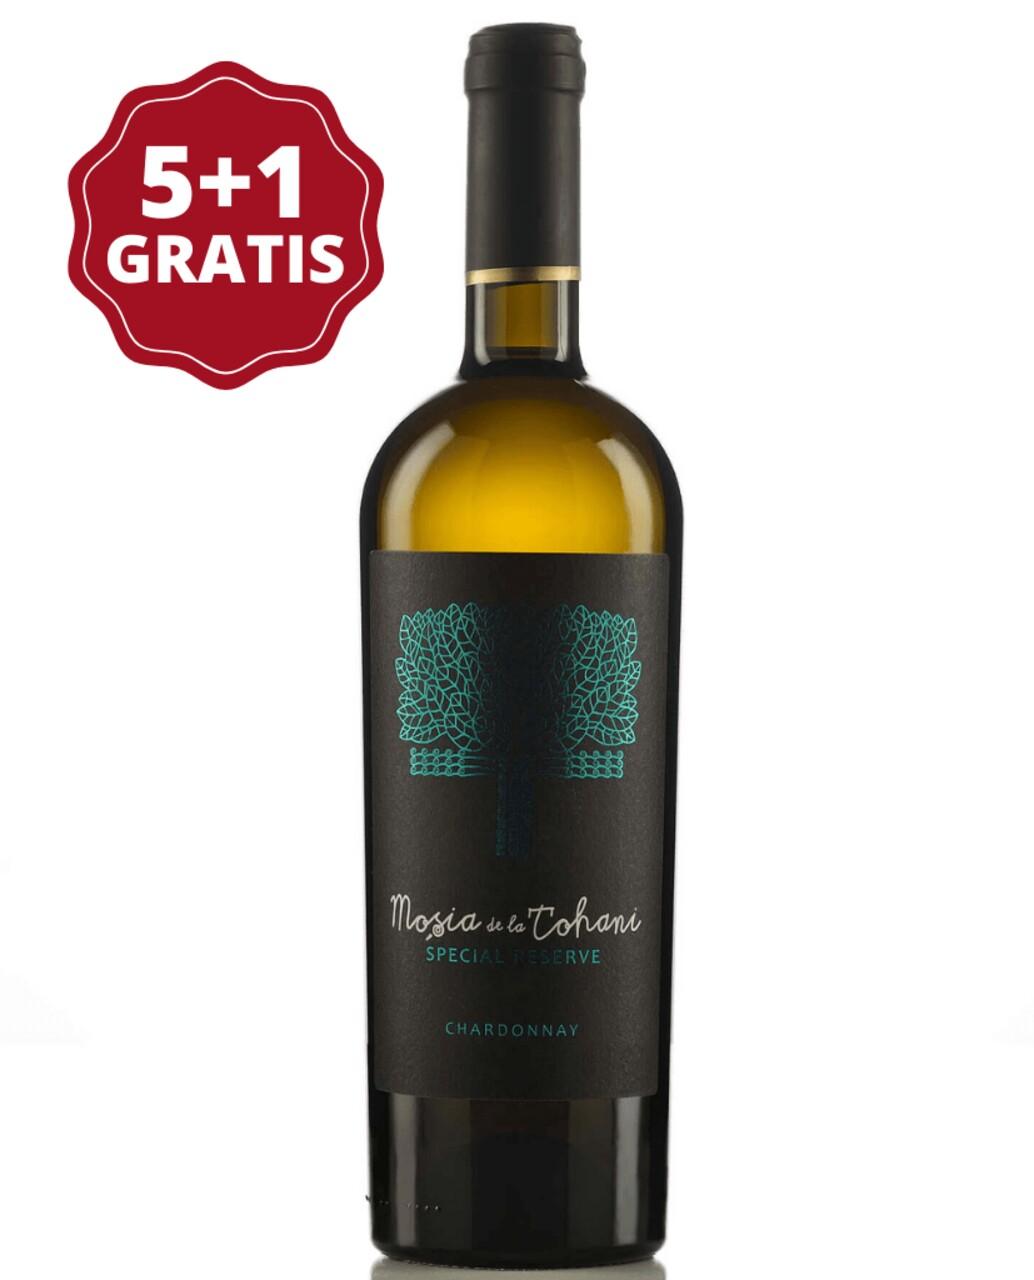 Mosia de la Tohani Special Reserve Chardonnay 5+1